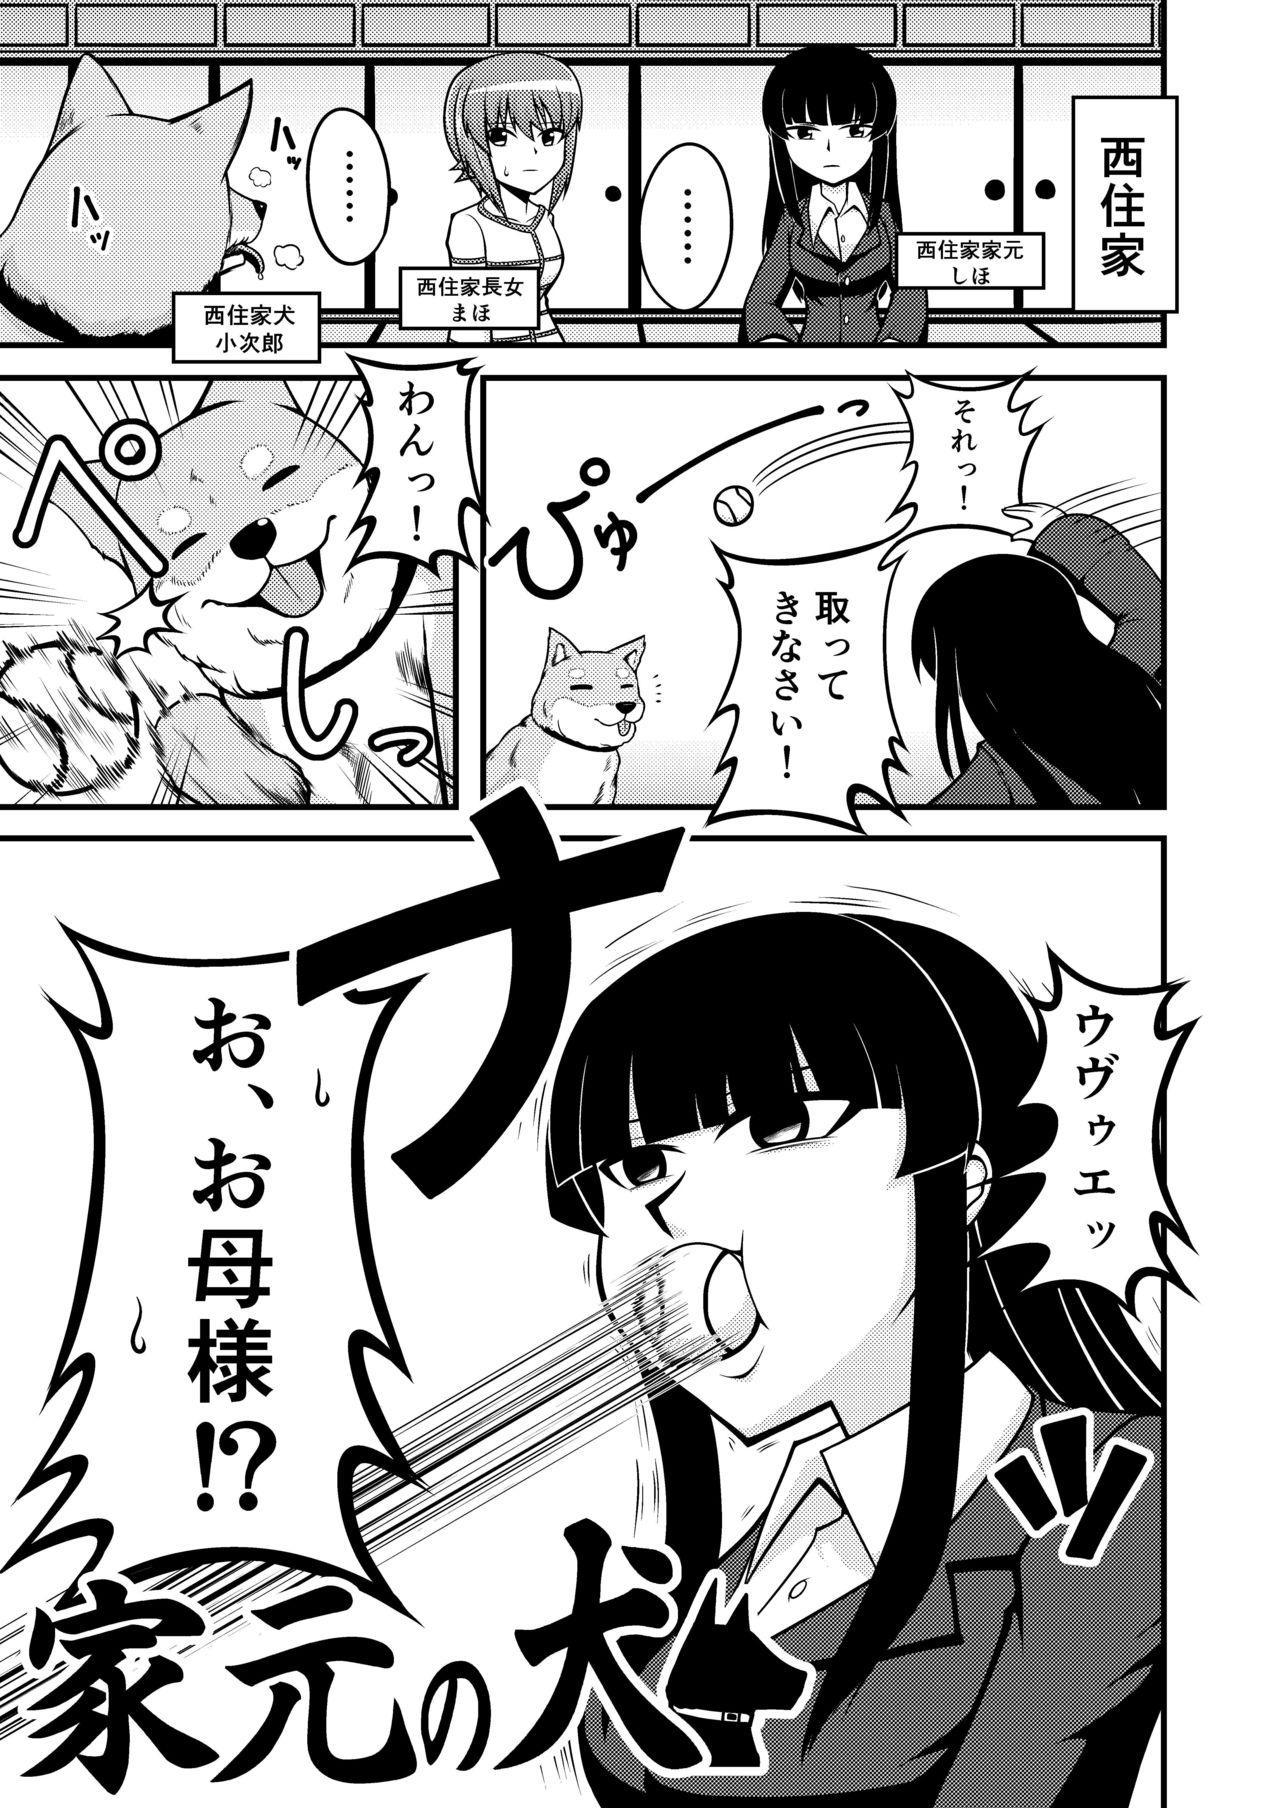 Garupan Iemoto Manga 『Iemoto no Inu』 0